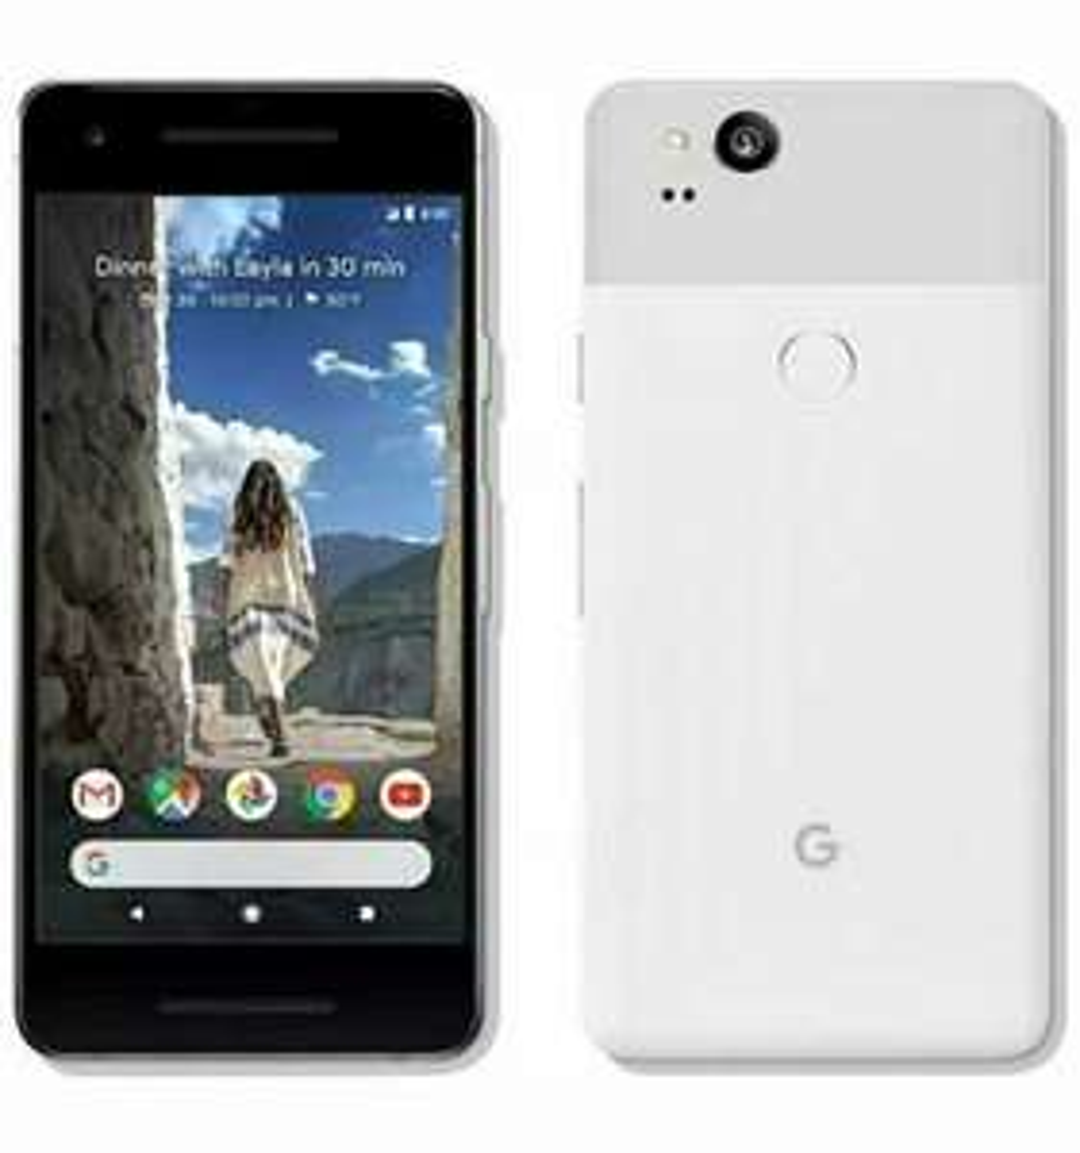 Google Pixel 2 White Unlocked 64GB Smartphone - Reasonable Condition - £86.39 @ XS Items Ebay